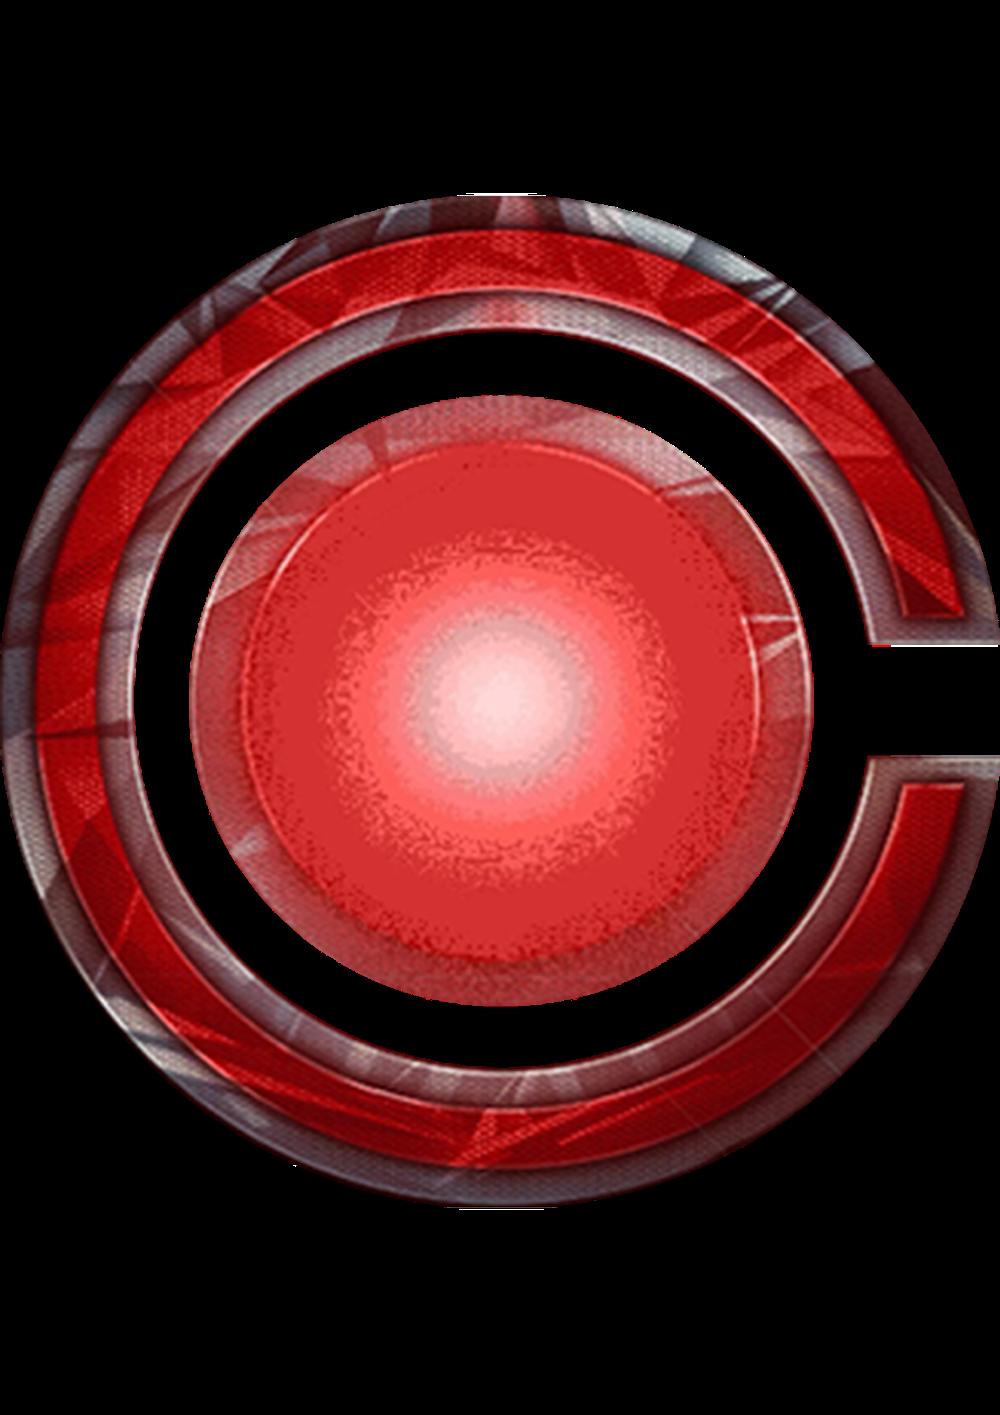 Dceu Cyborg Logo Transparent By Natan Ferri On Deviantart Cyborg Logo Cyborg Logos